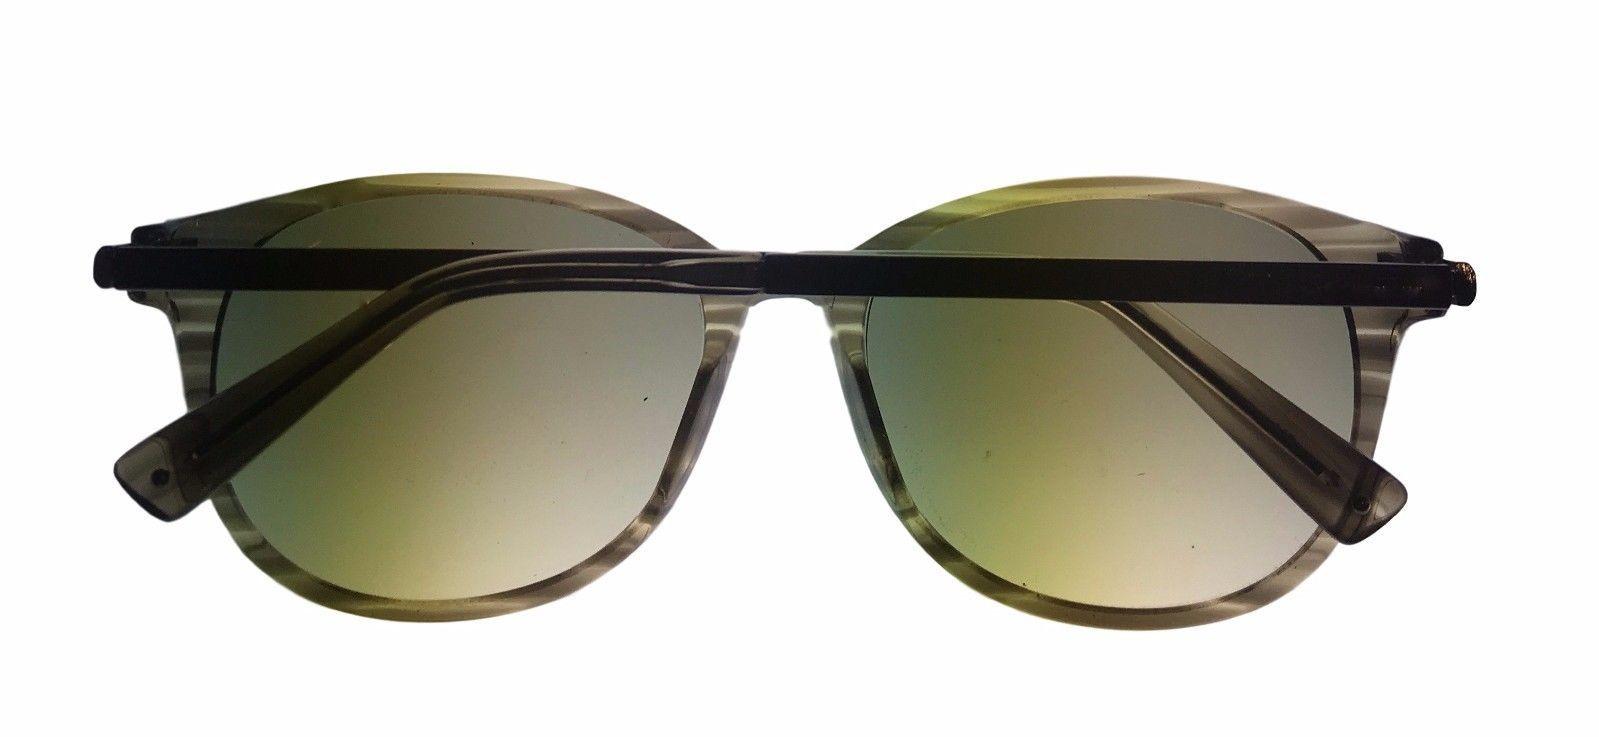 Kenneth Cole New York Mens Sunglass Soft Round Black, Smoke Lens KC7006 98F image 5